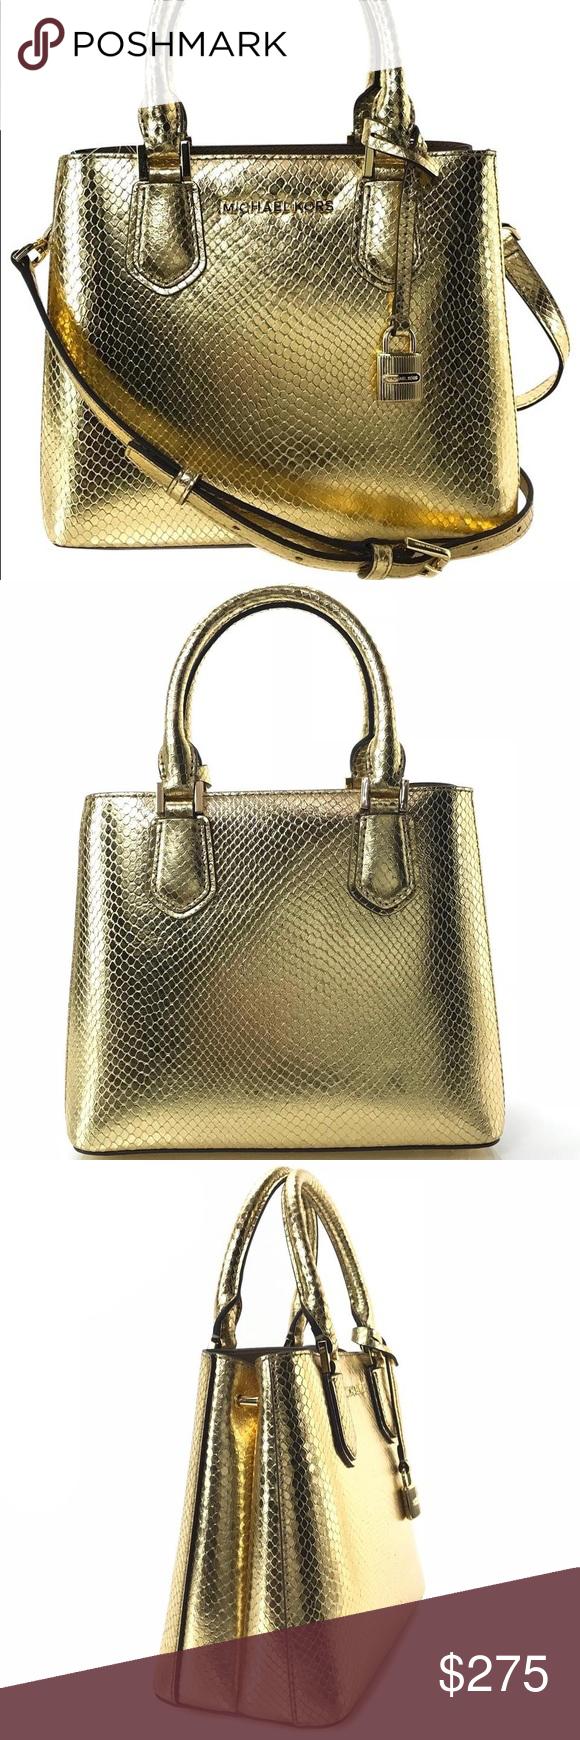 3342f77e7f92 Michael Kors purse Michael Kors NWT Adele Medium Shoulder Gold Embossed  Leather Messenger Bag Model